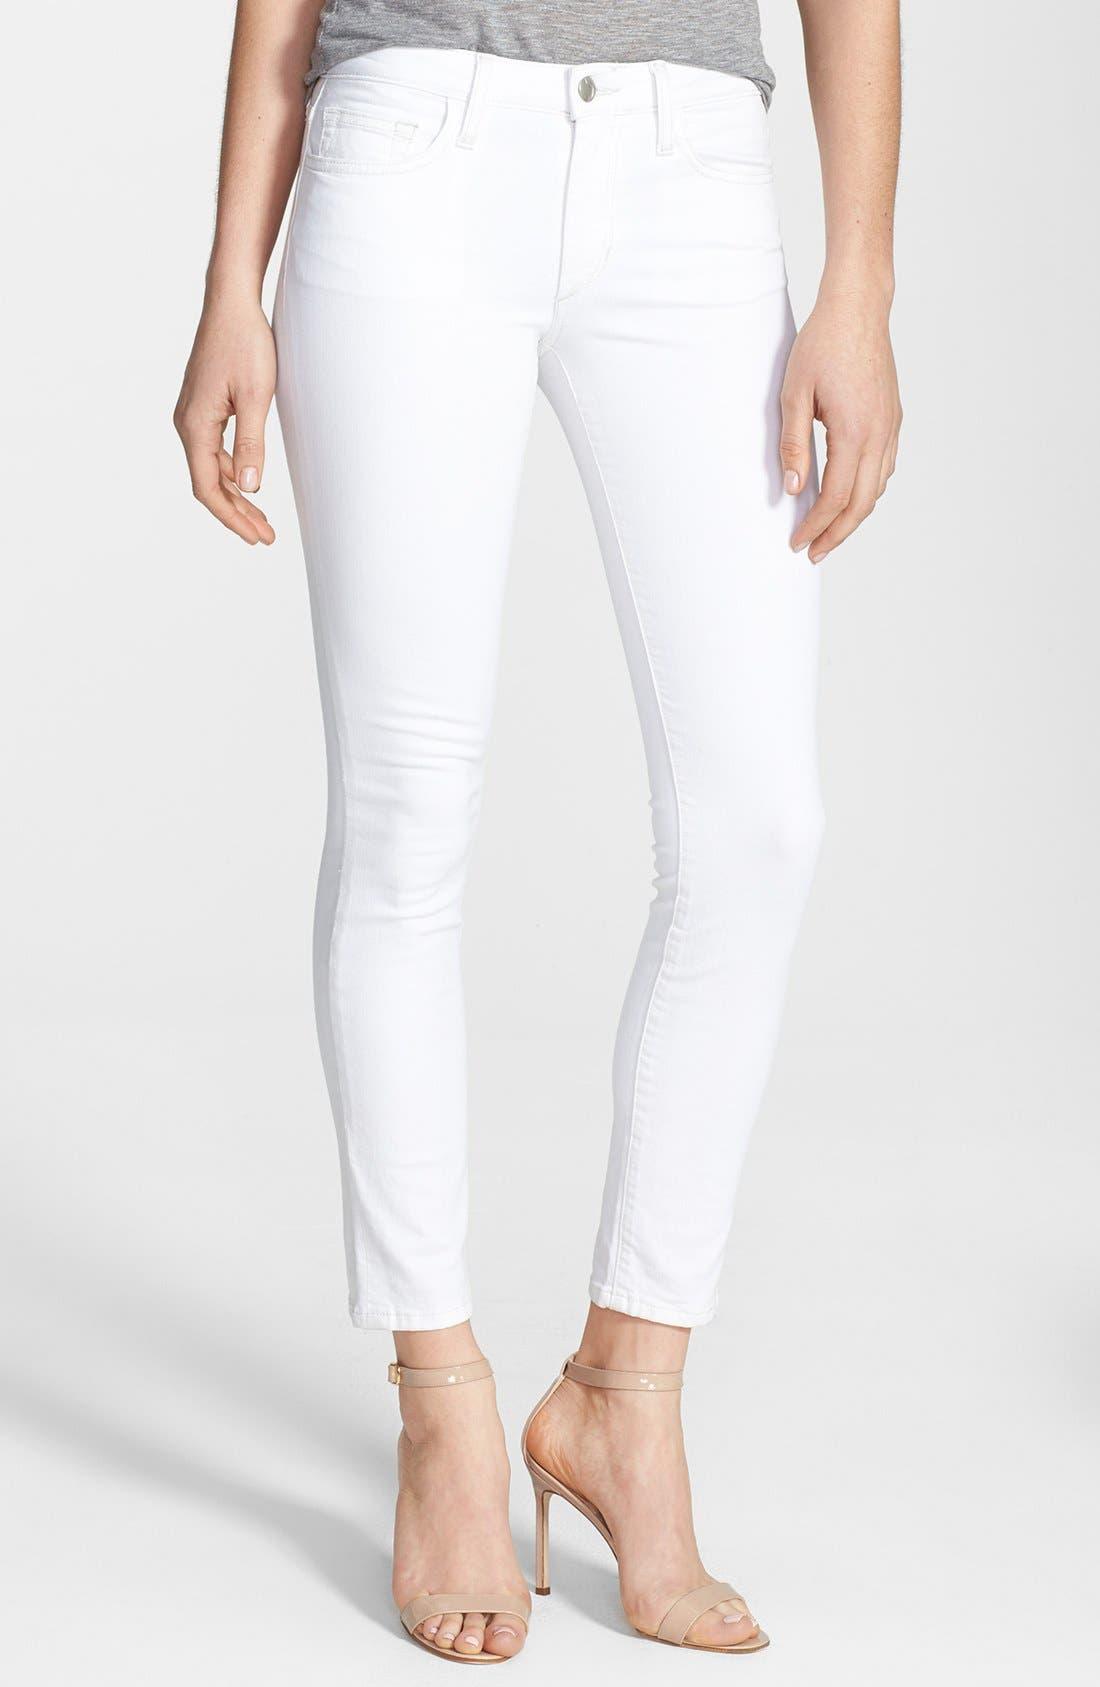 Main Image - Joe's Stretch Skinny Ankle Jeans (Pennie)